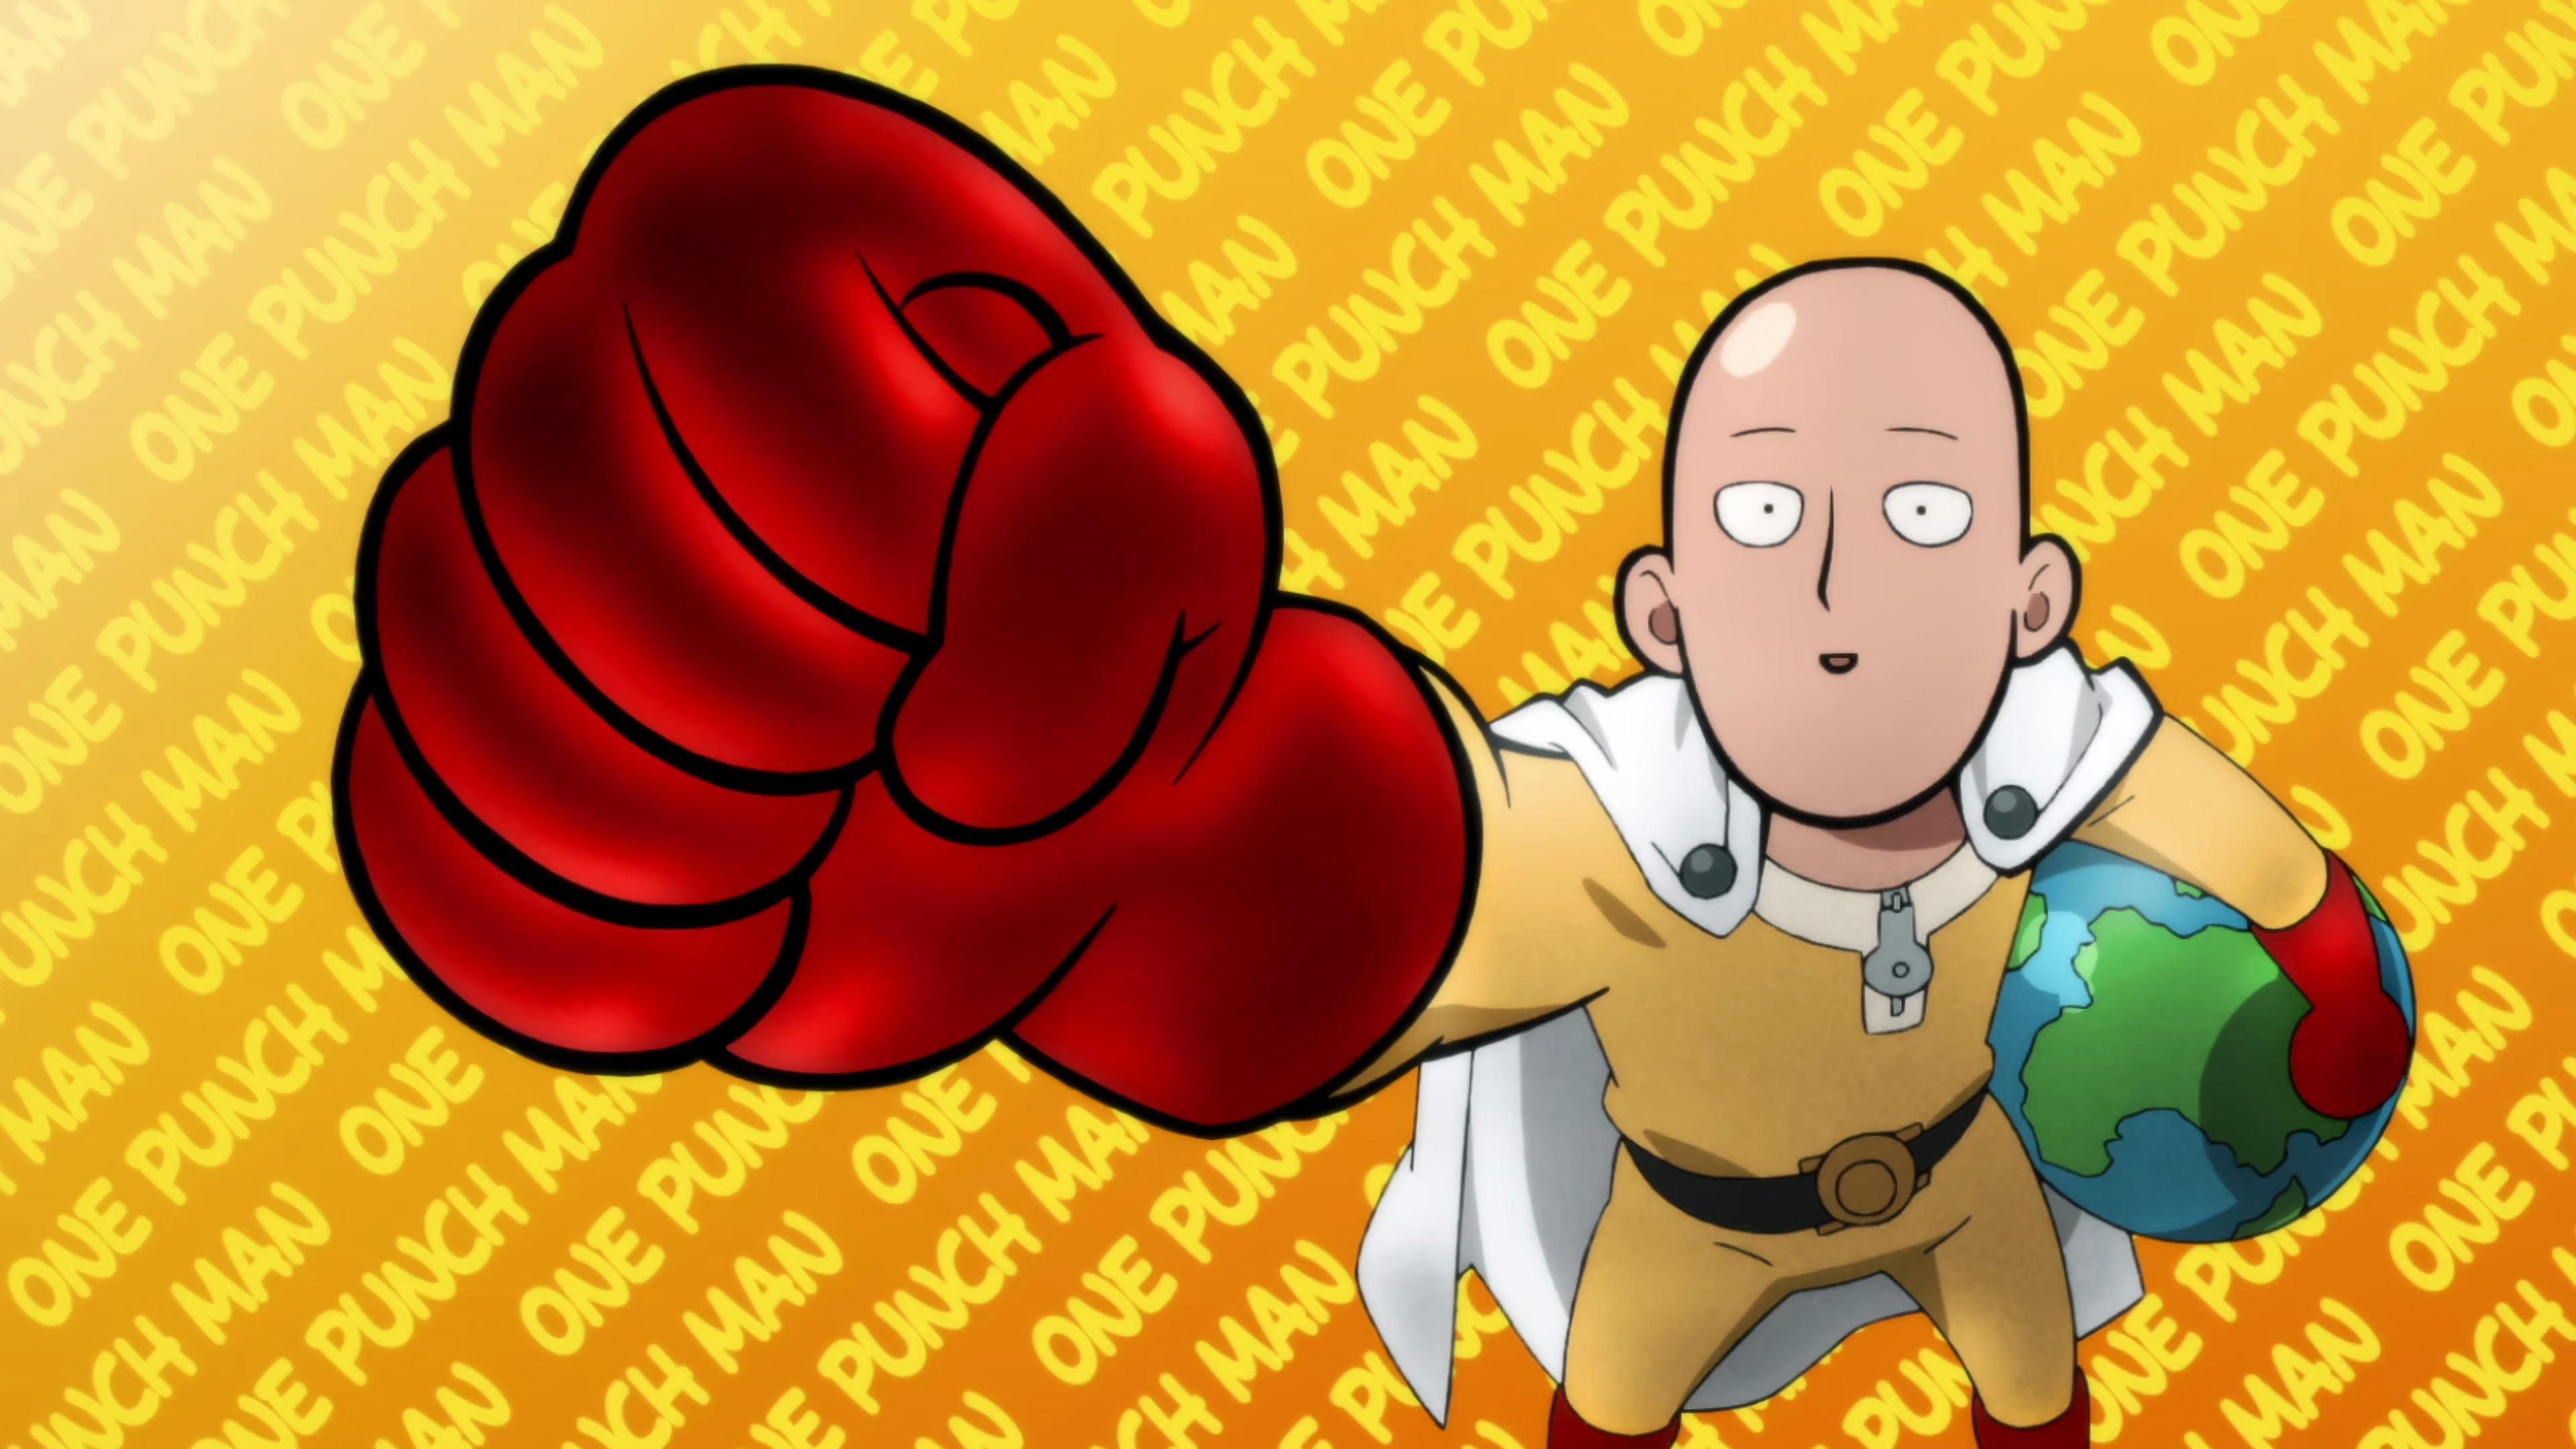 Wallpaper : One Punch Man, Saitama 3840x2160 - boriszms ...